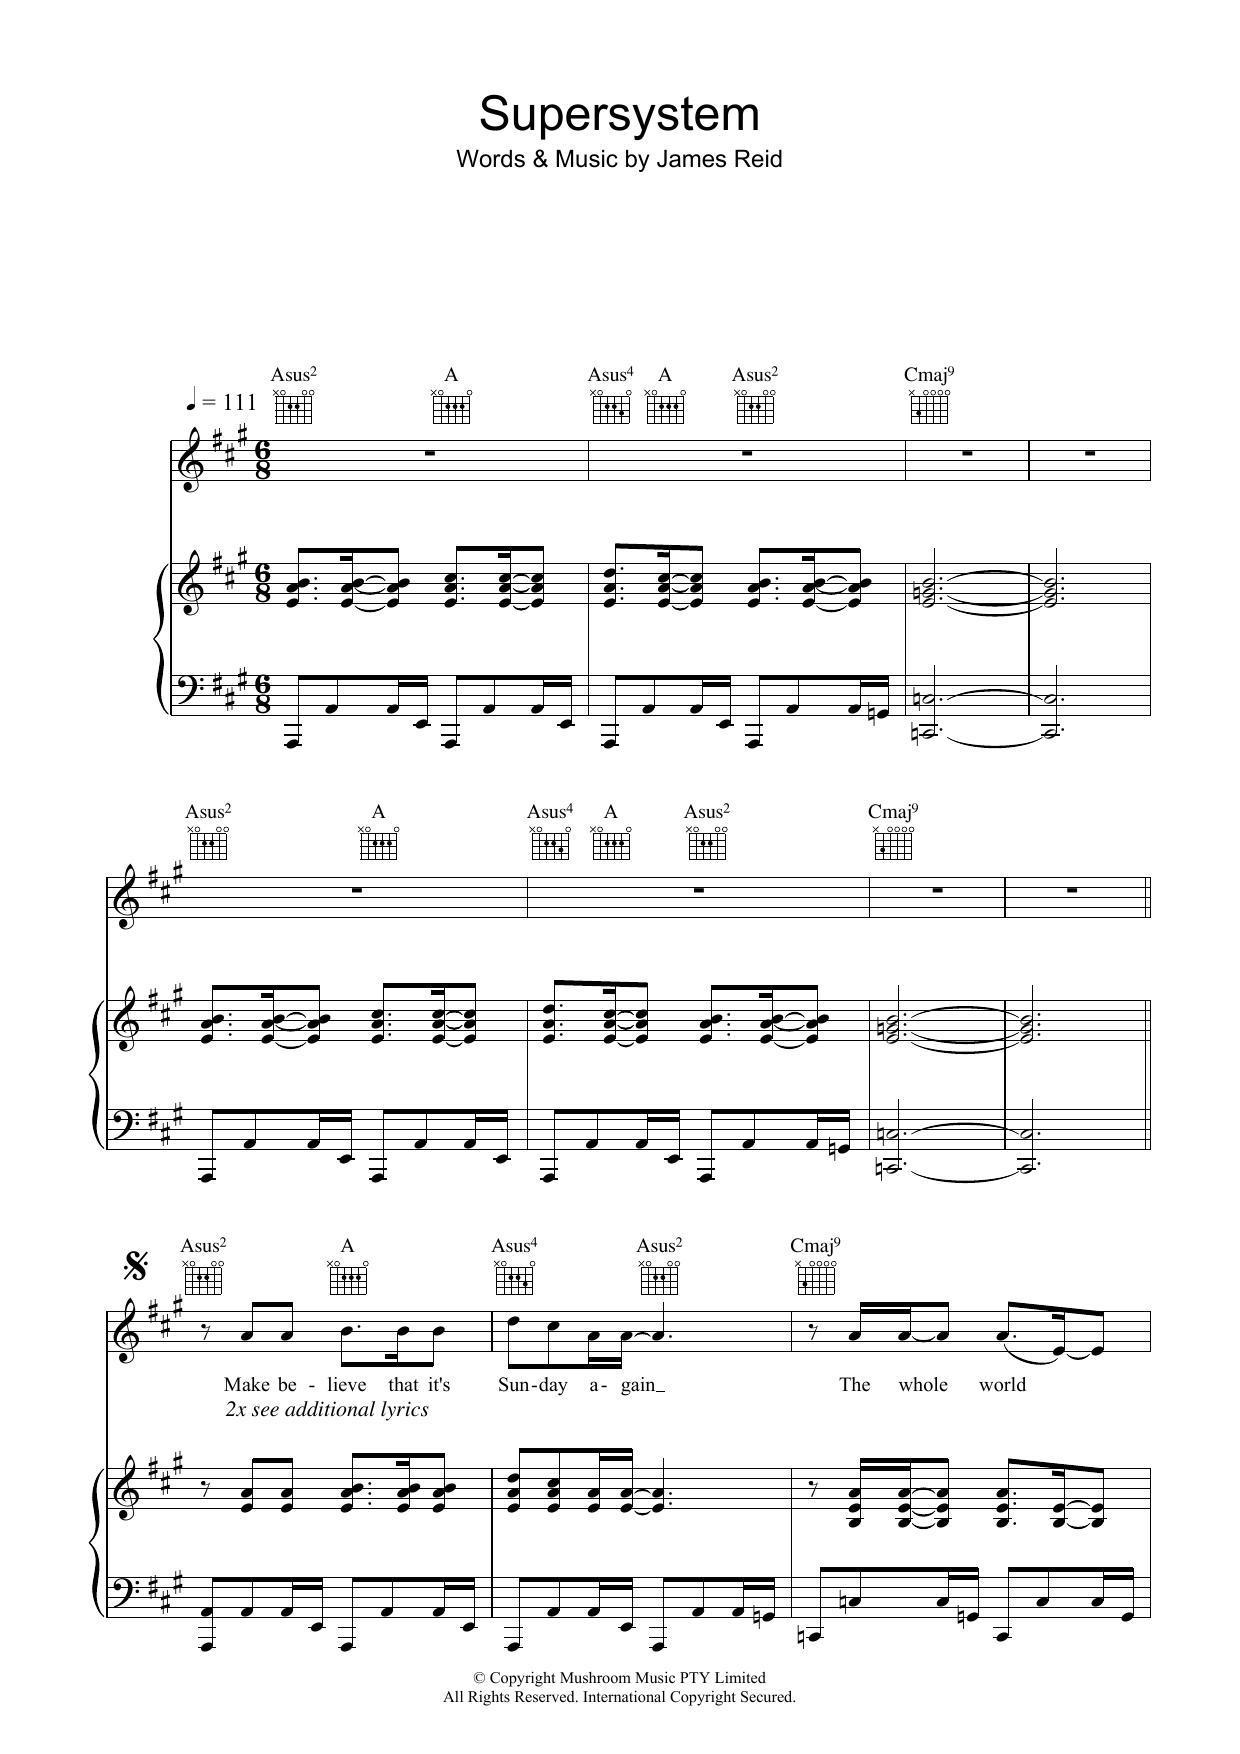 Supersystem Sheet Music